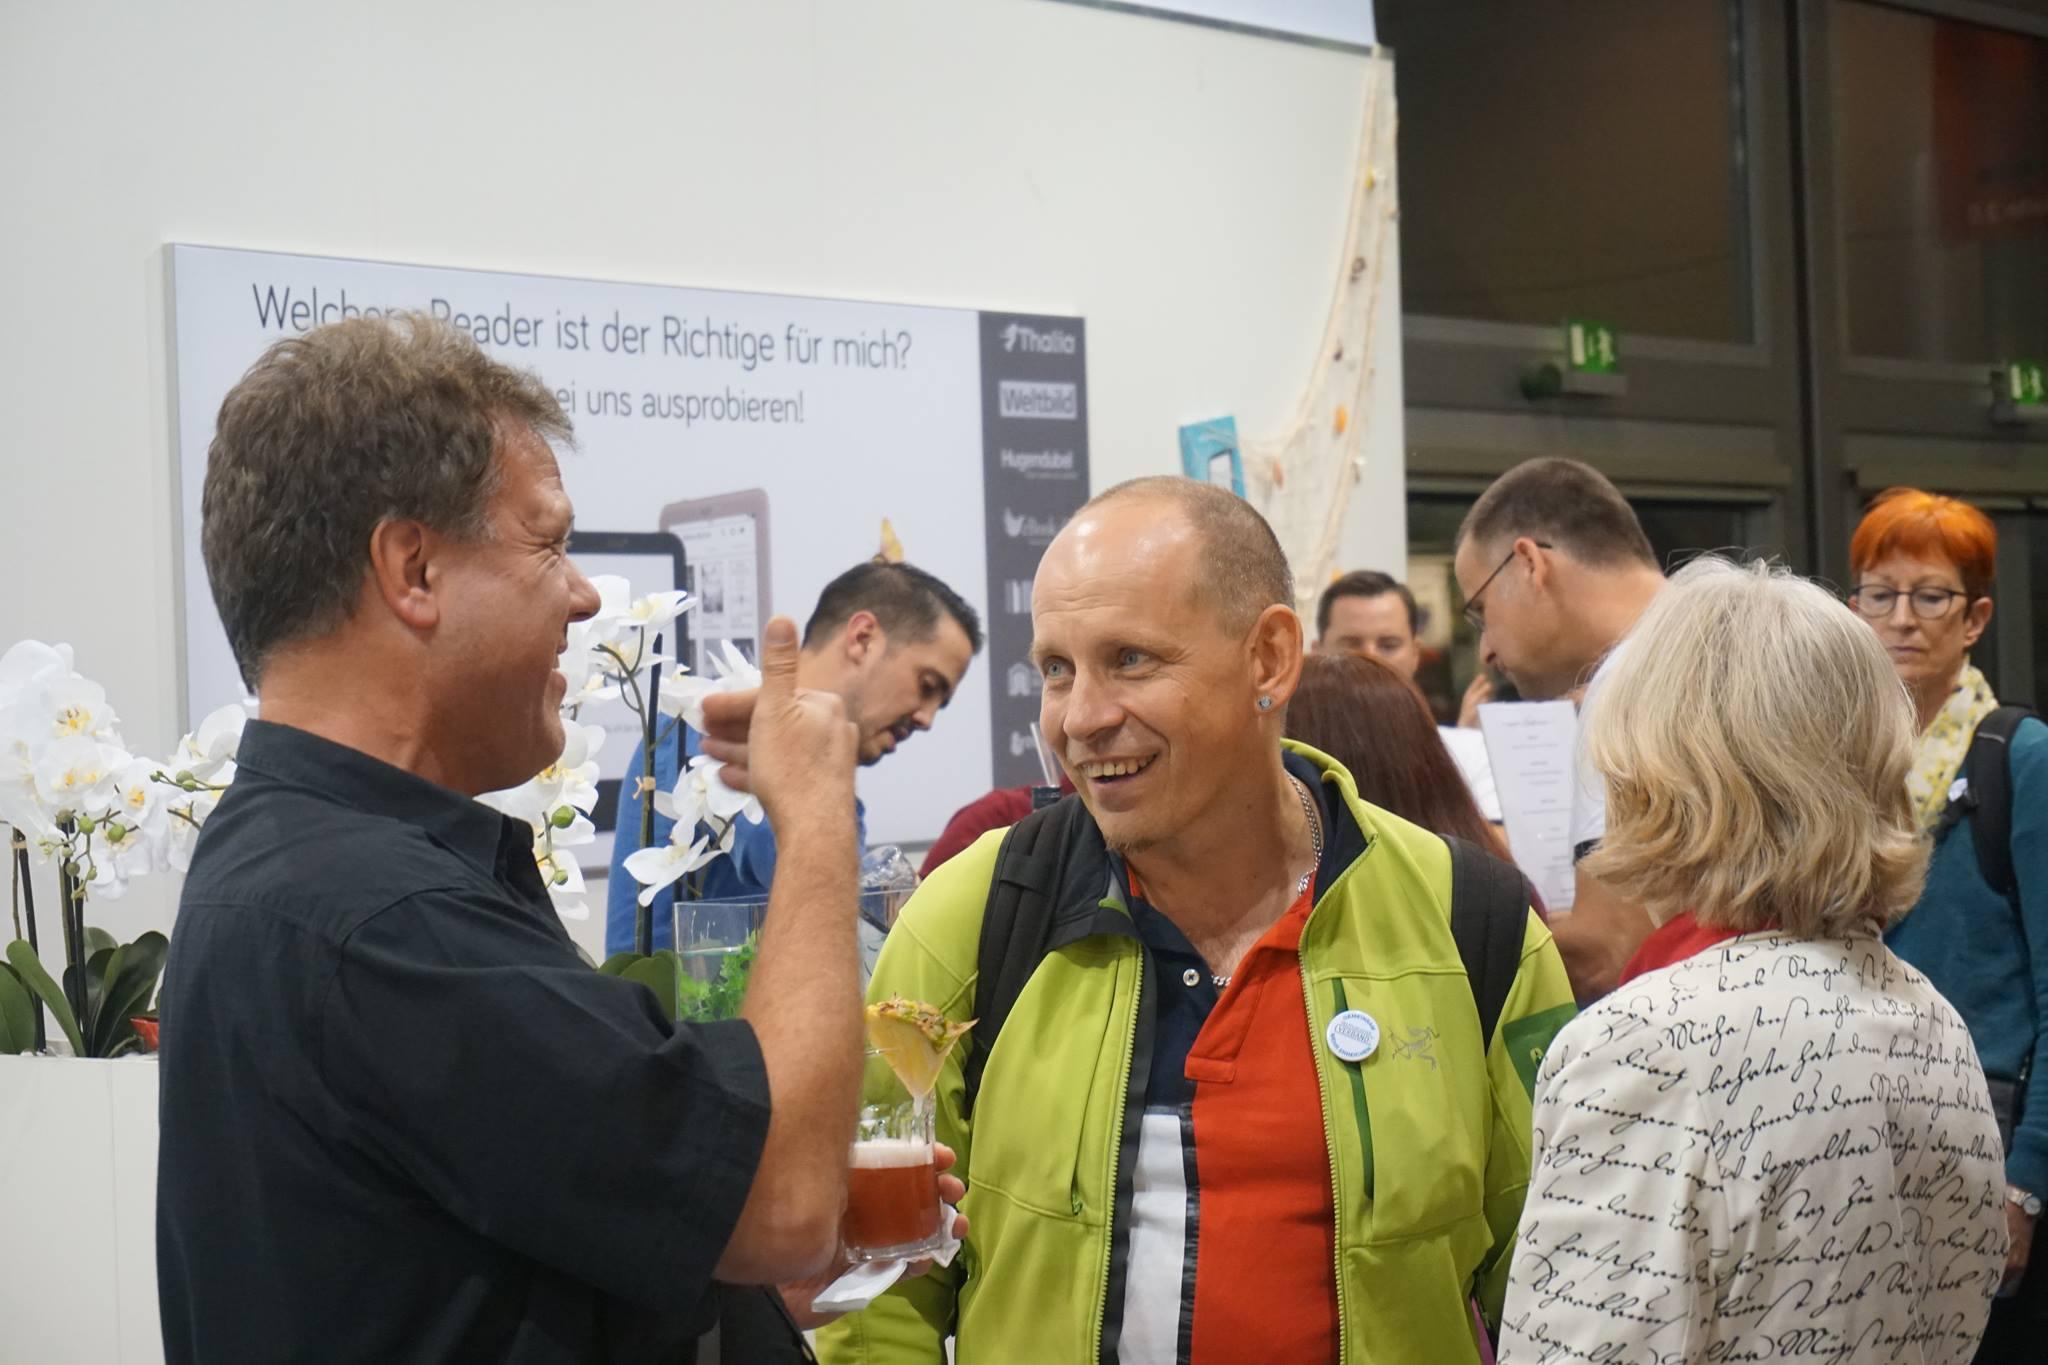 Die Frankfurter Buchmesse, Self-Publishing-Bewegung und Blended Business – Folge 138